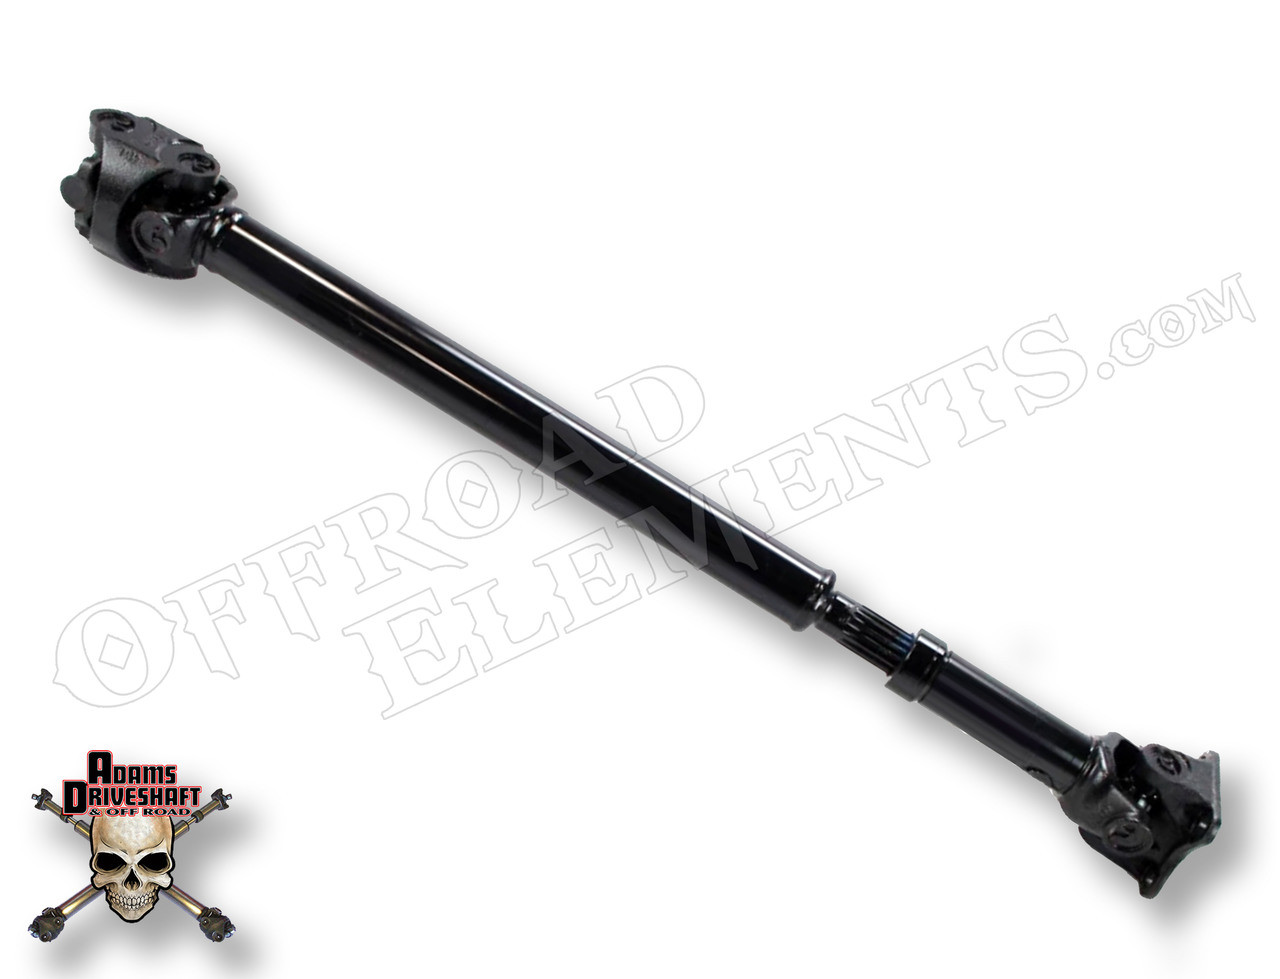 Adams Driveshaft AD-JK1350R 1350 Rear Rock Crawler CV Driveshaft for Wrangler JK 2007+